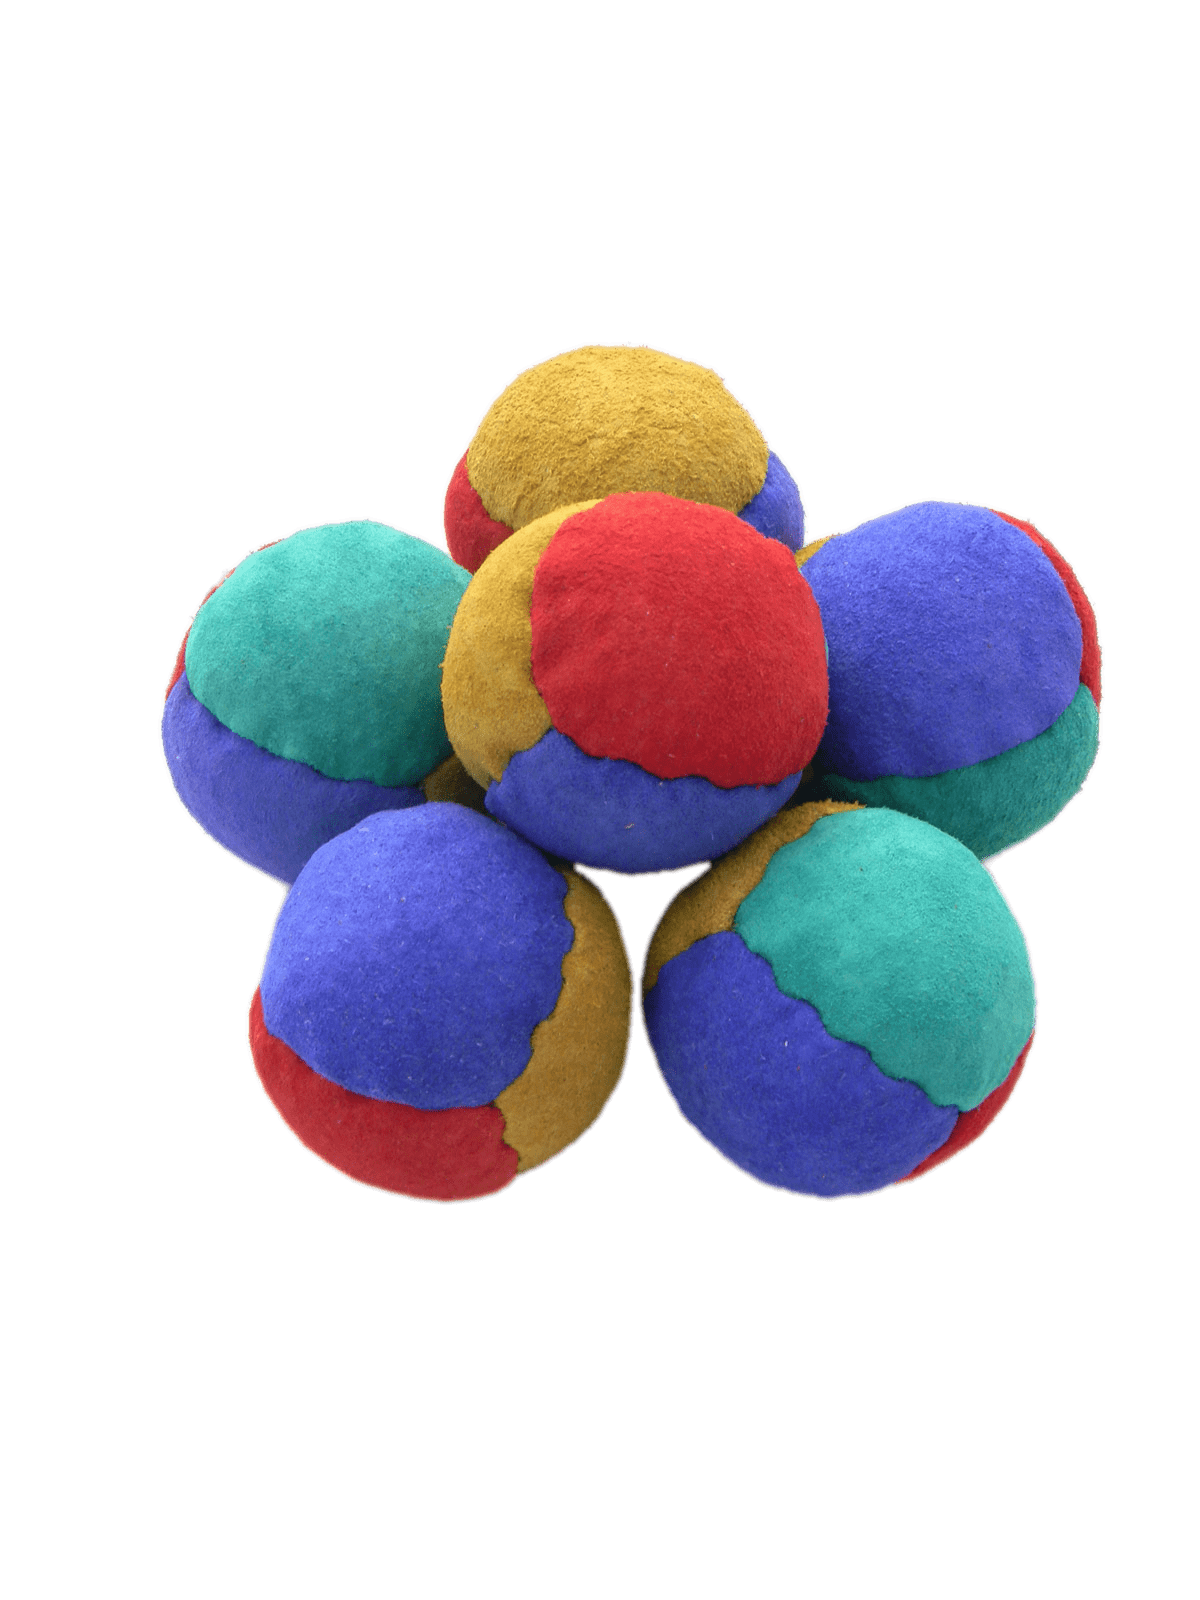 Incredible Beanbag Juggling Balls Transparent Png Stickpng Dailytribune Chair Design For Home Dailytribuneorg